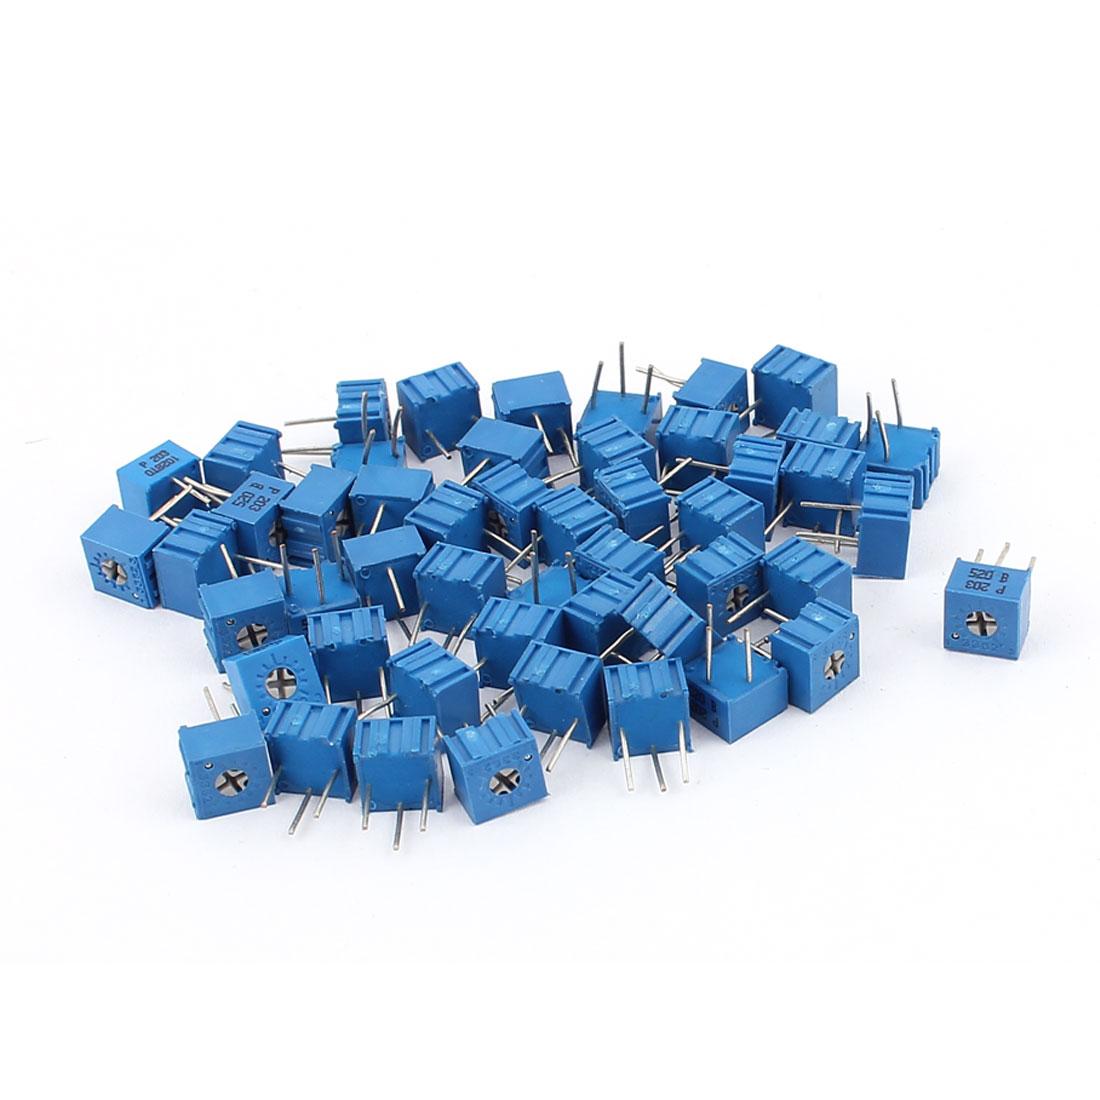 50Pcs Adjustable Potentiometer Trimmer Variable Resistor 3362P-203 20K Ohm